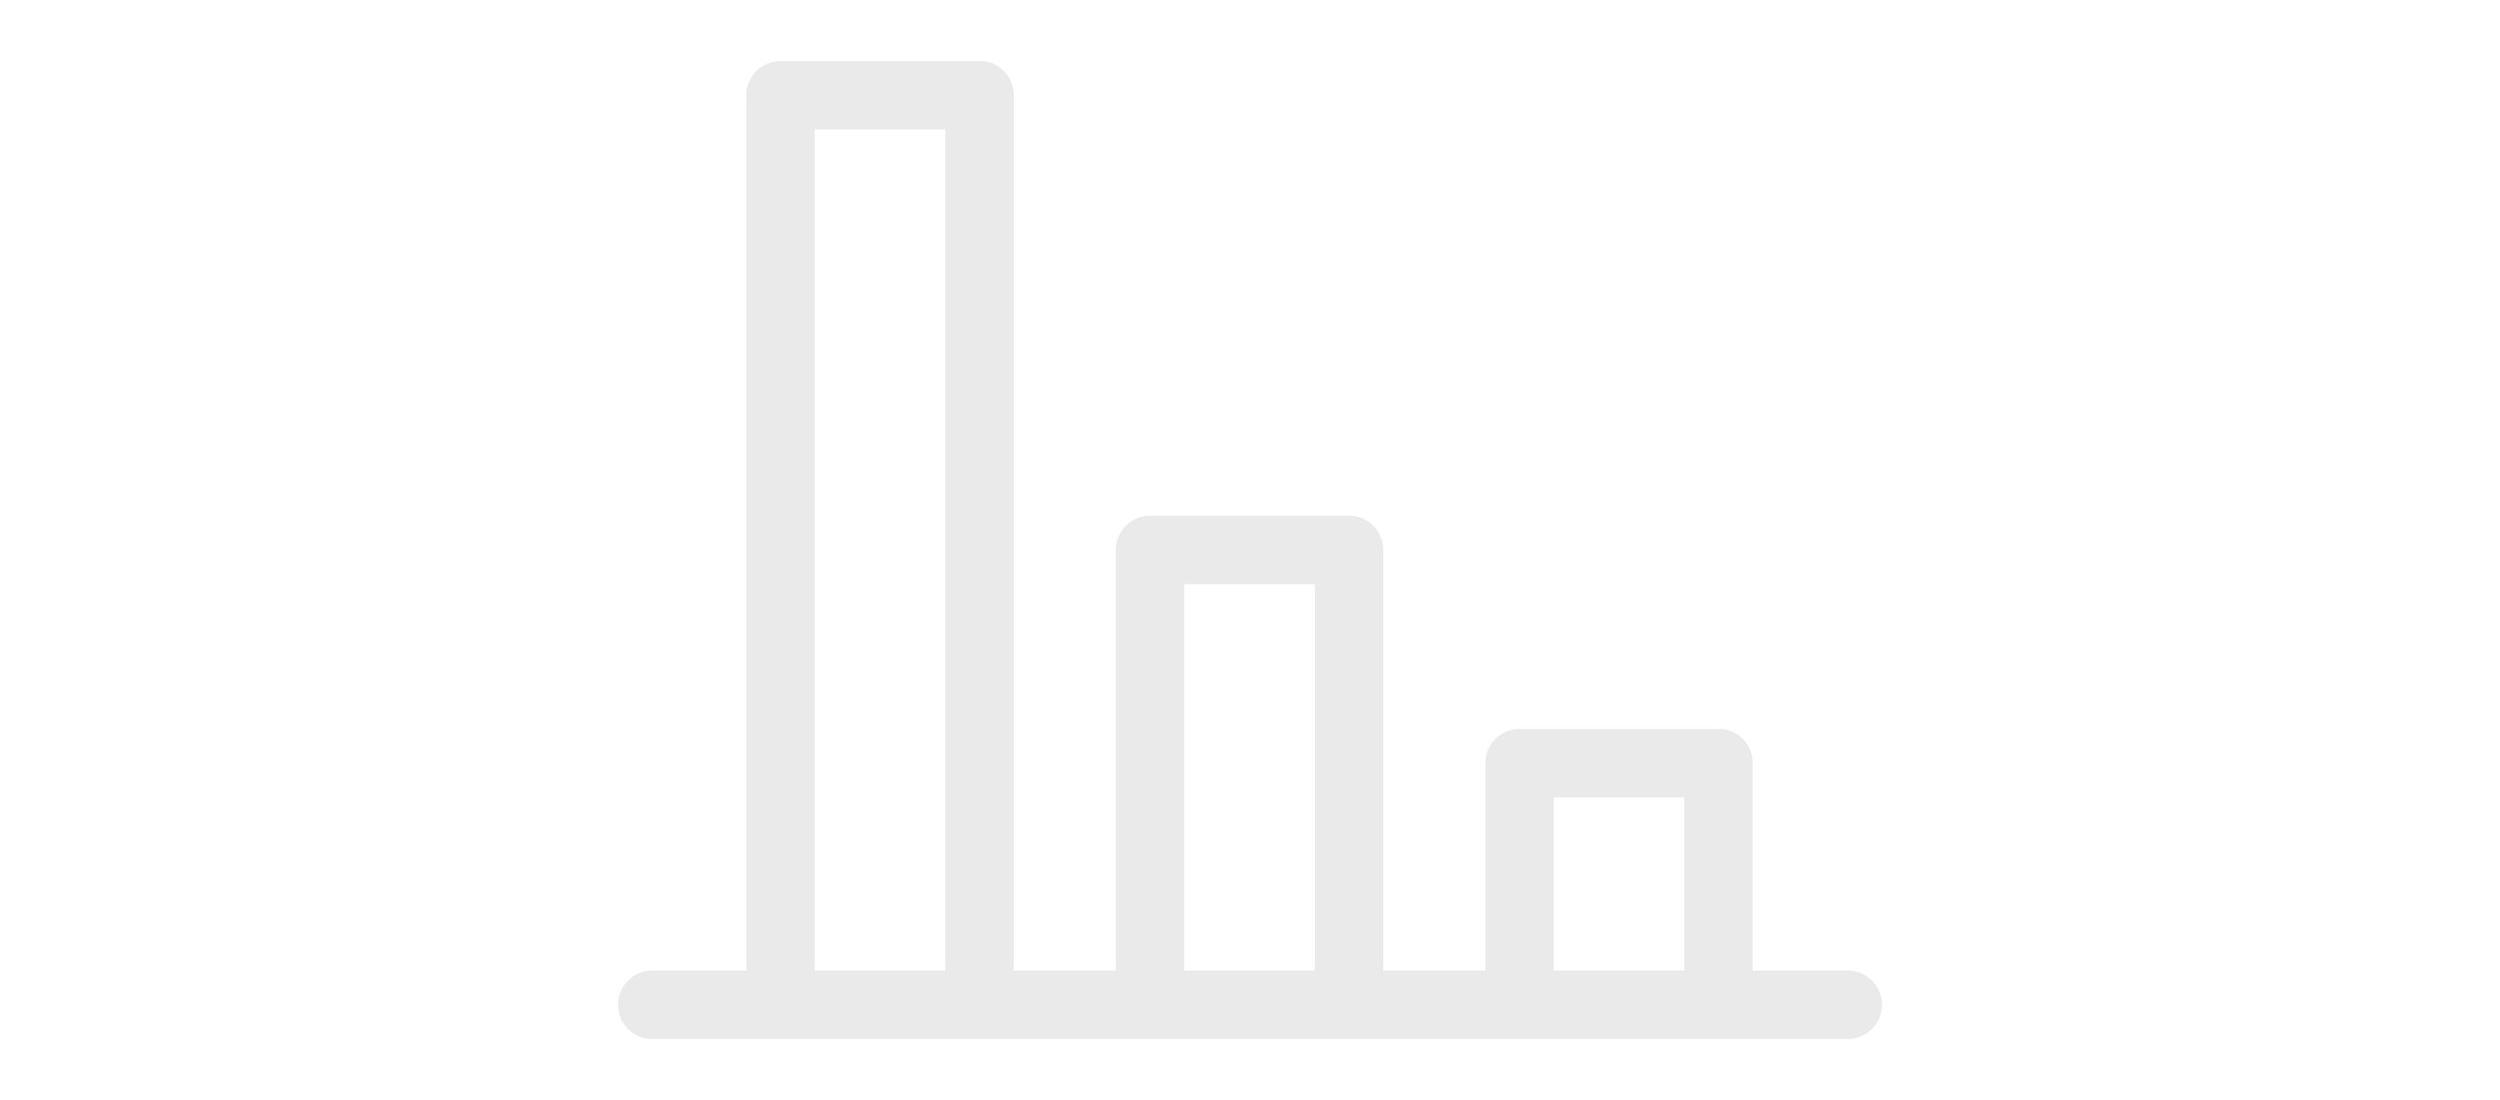 Fewer DBPs-01.jpg